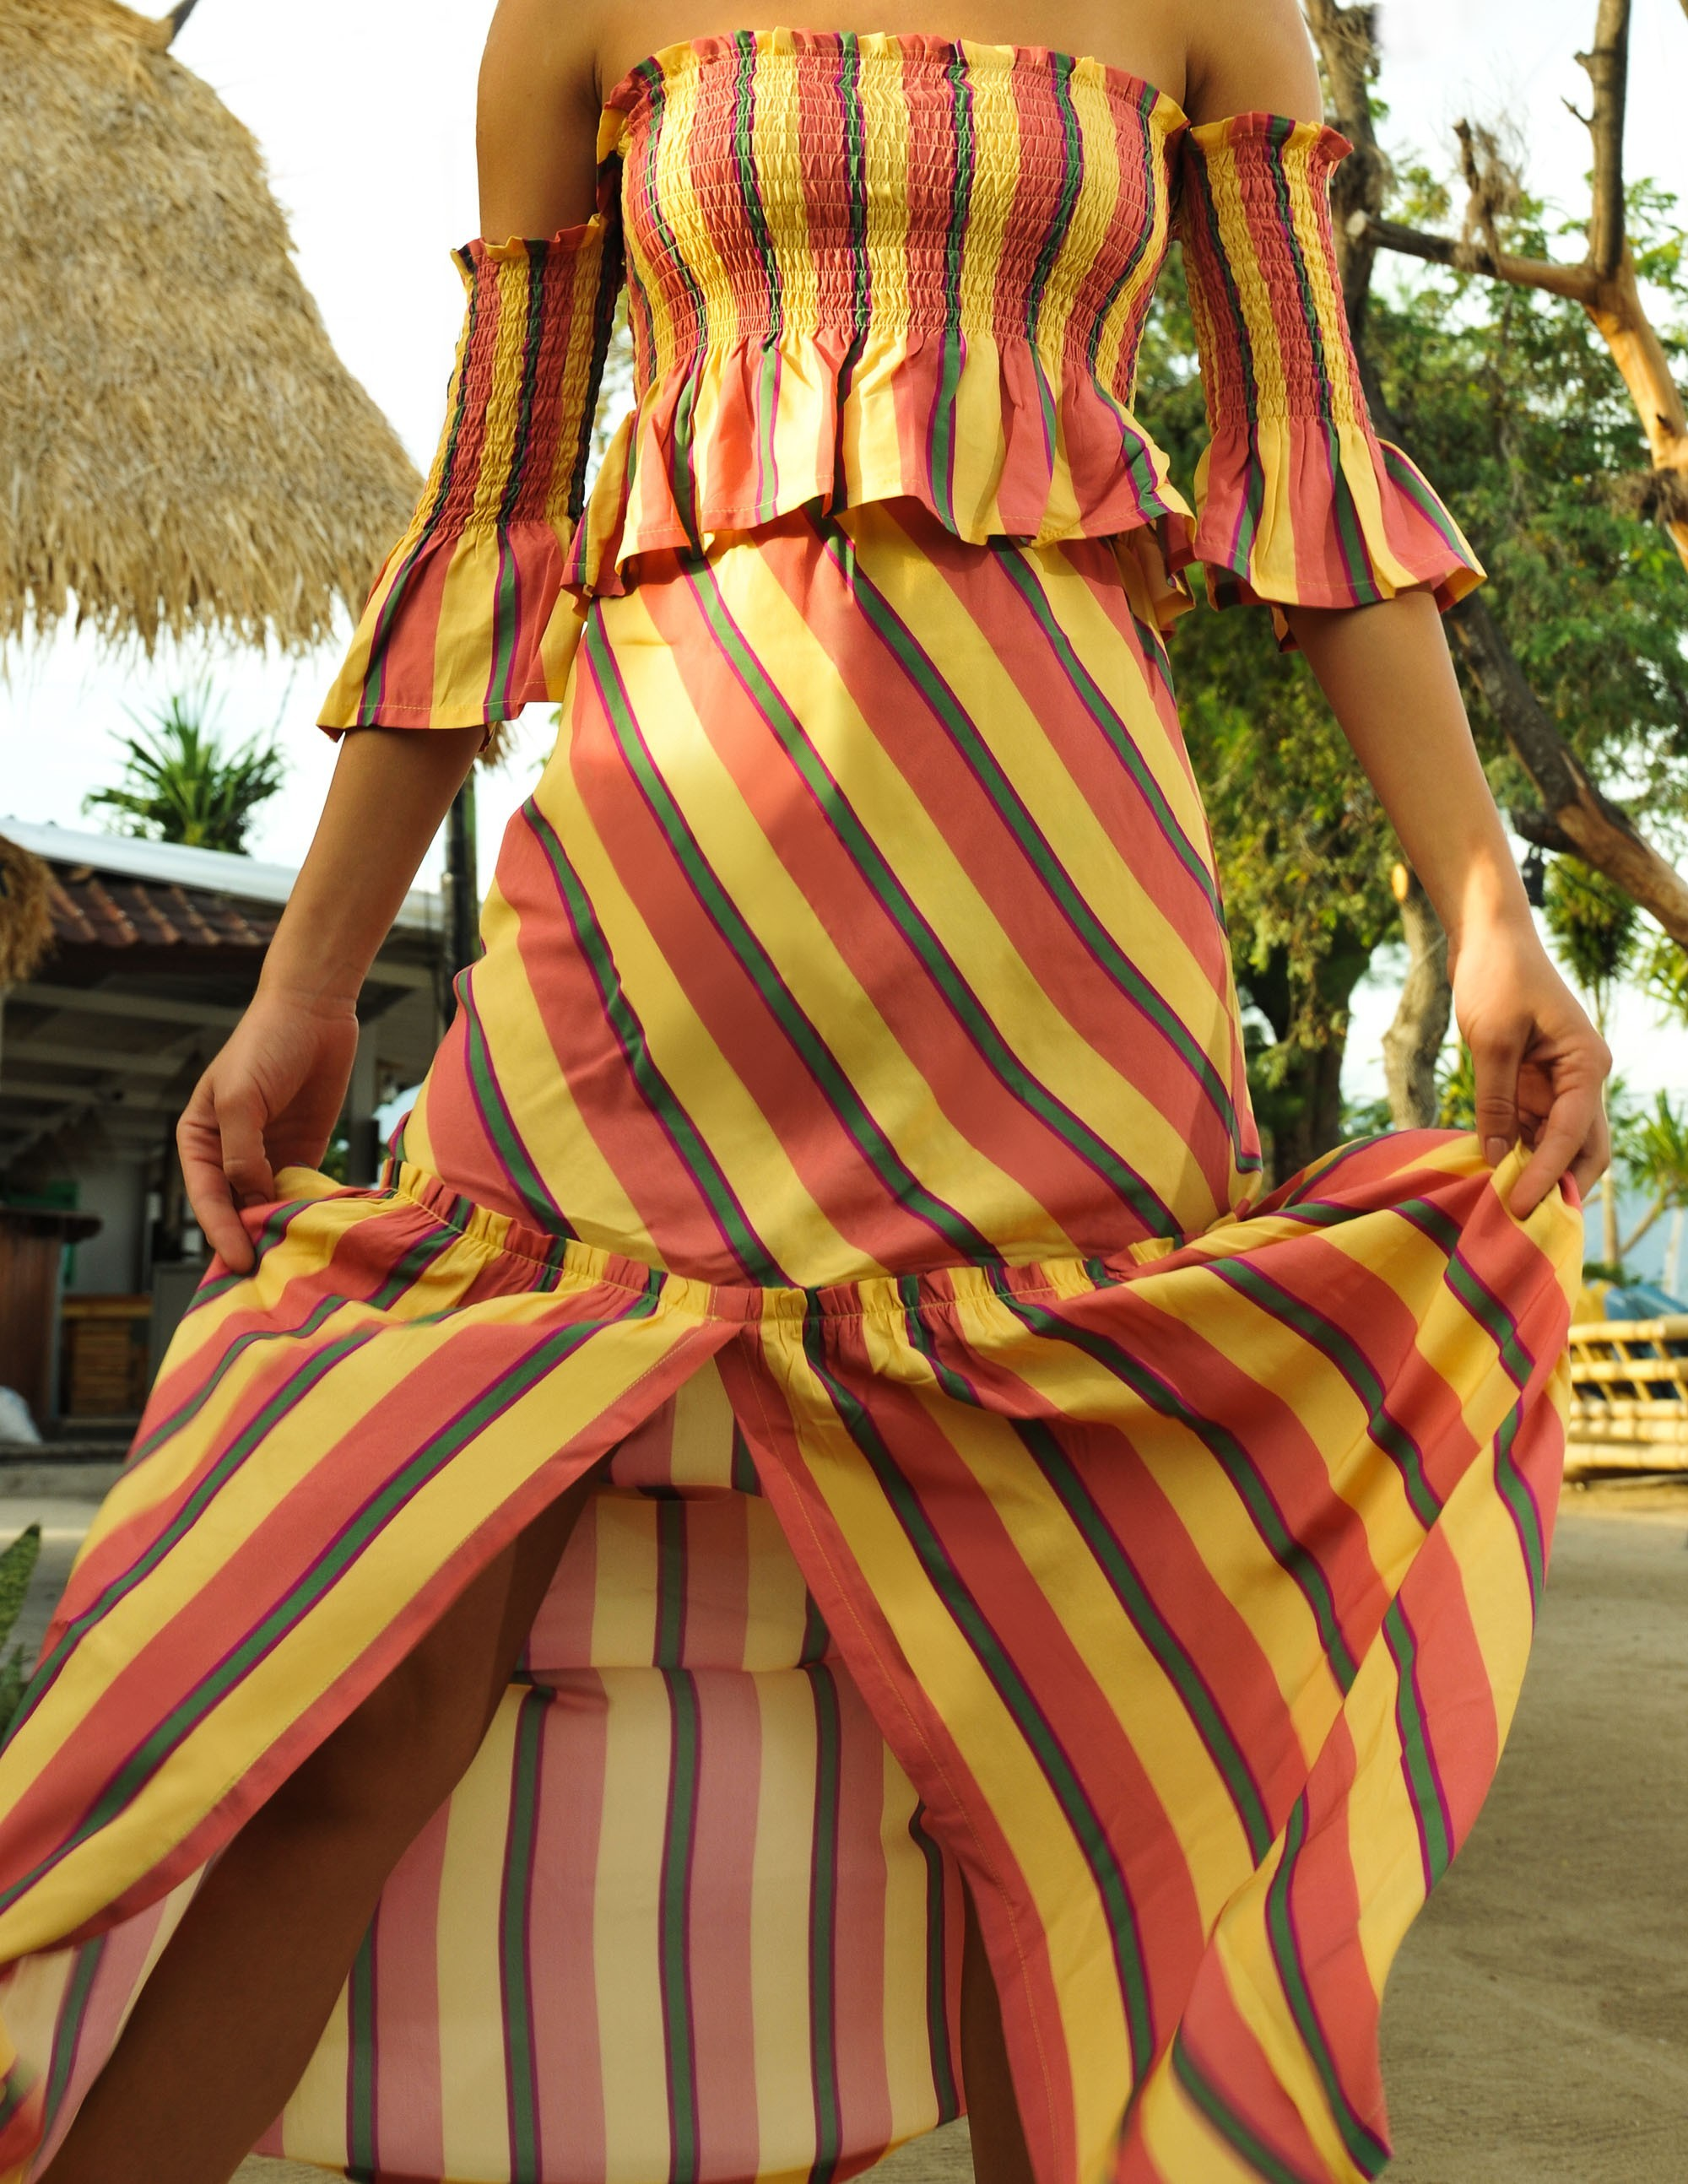 MACARELLA Skirt - TUTTI FRUTTI